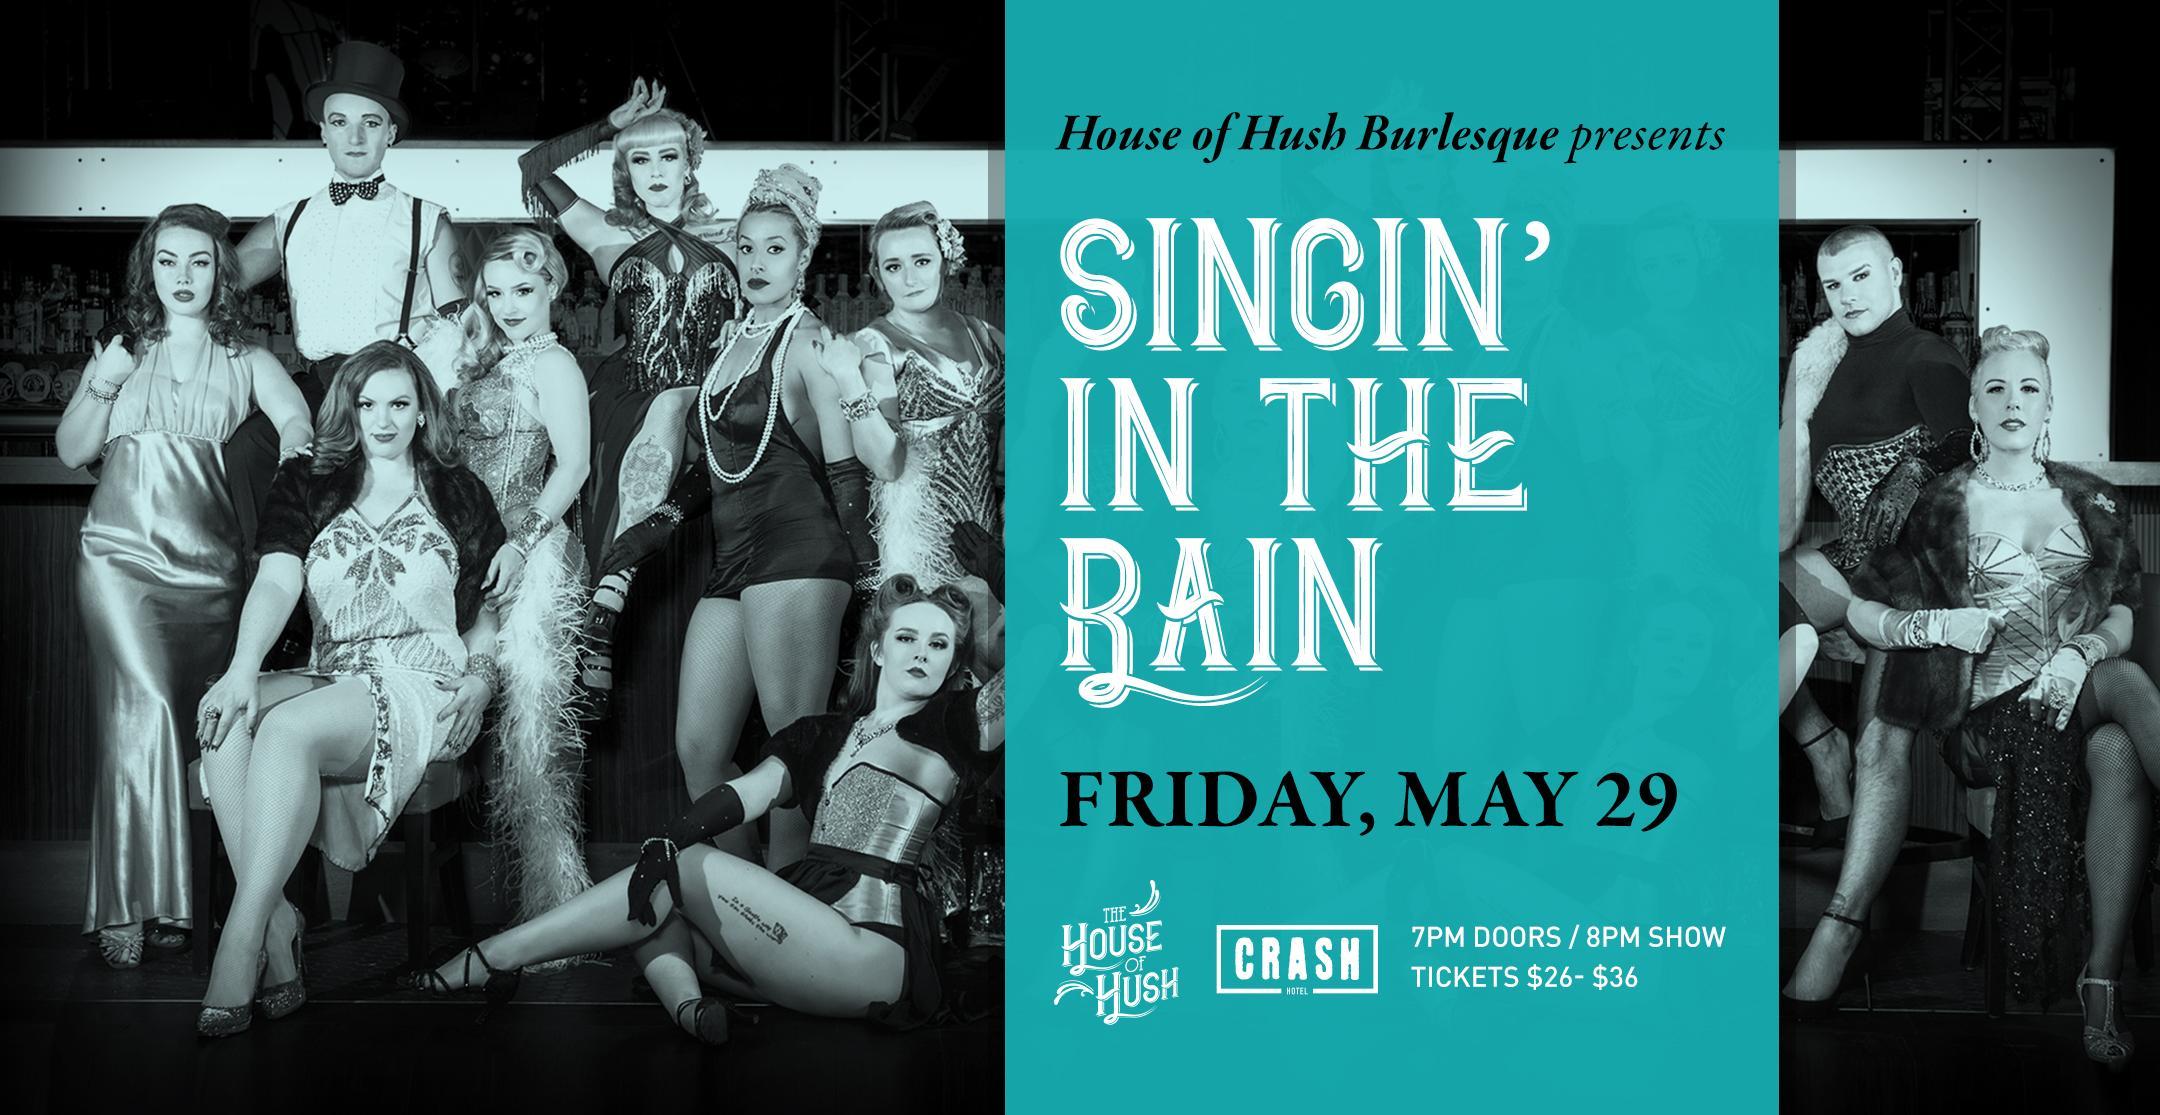 House of Hush presents: Singin' in the Rain